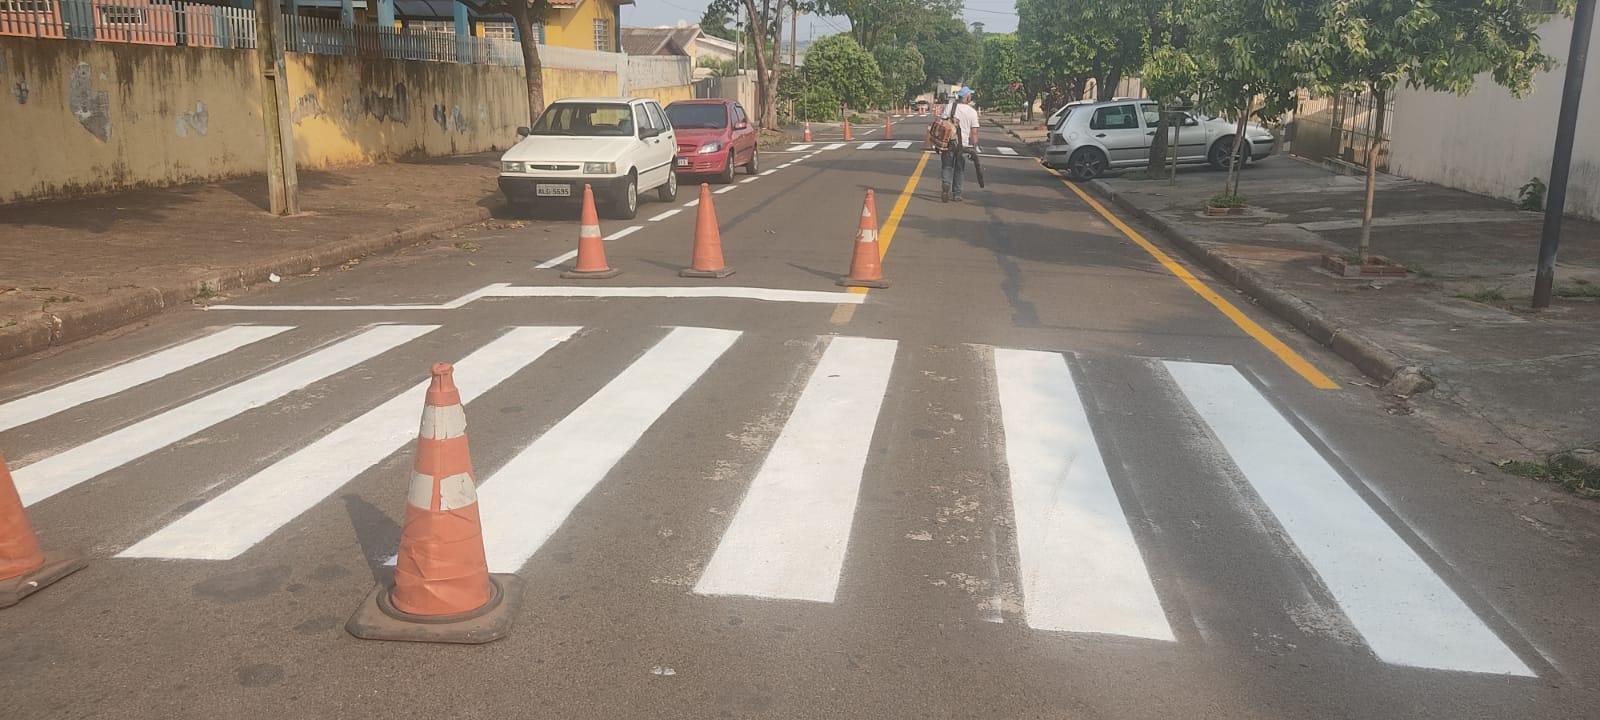 Trânsito: Secretaria atende pedido para pintura de faixas